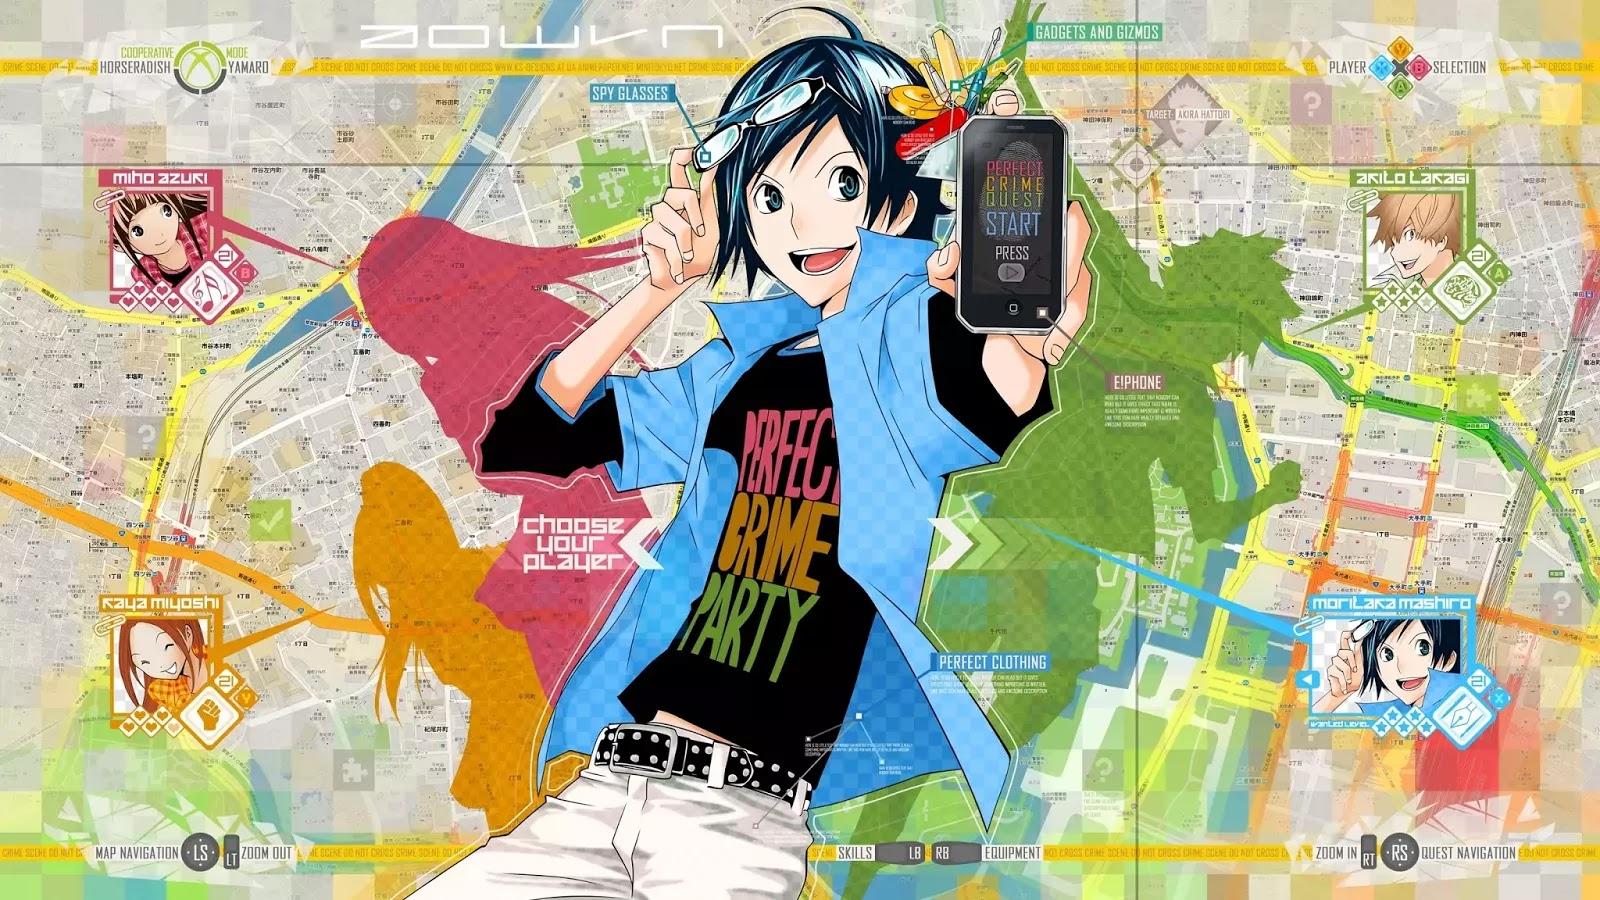 bakuman aowvn%2B%25281%2529 - [ Anime 3gp Mp4 ] Bakuman SS1 + SS2 + SS3 | Vietsub - Cuộc Đời Mangaka